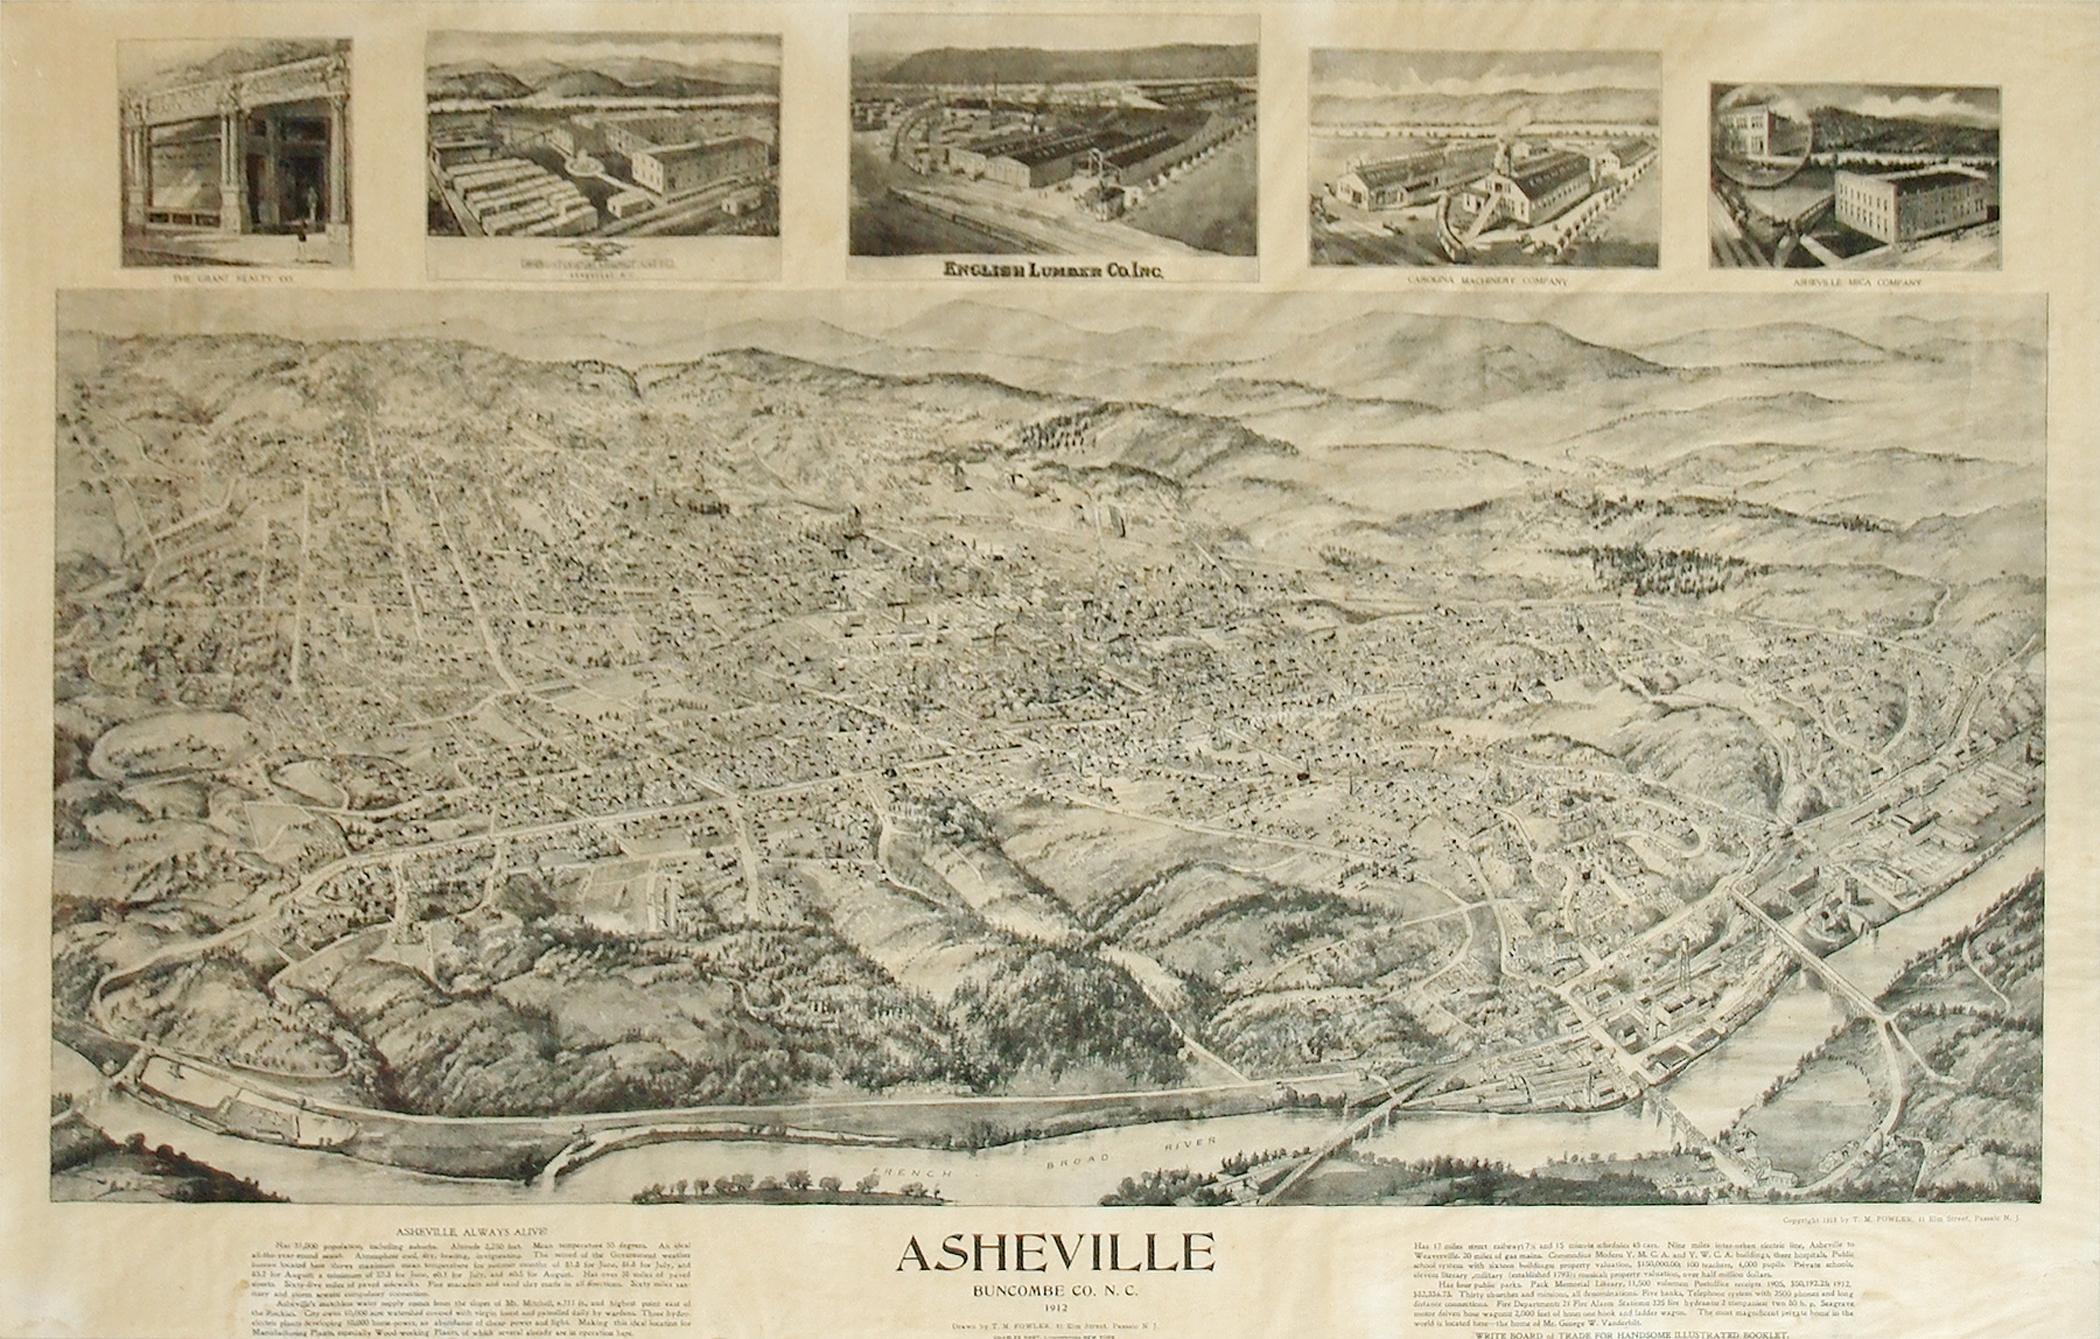 Asheville, Buncombe, Co., N.C. 1912: Thaddeus Mortimer Fowler (1842-1922)